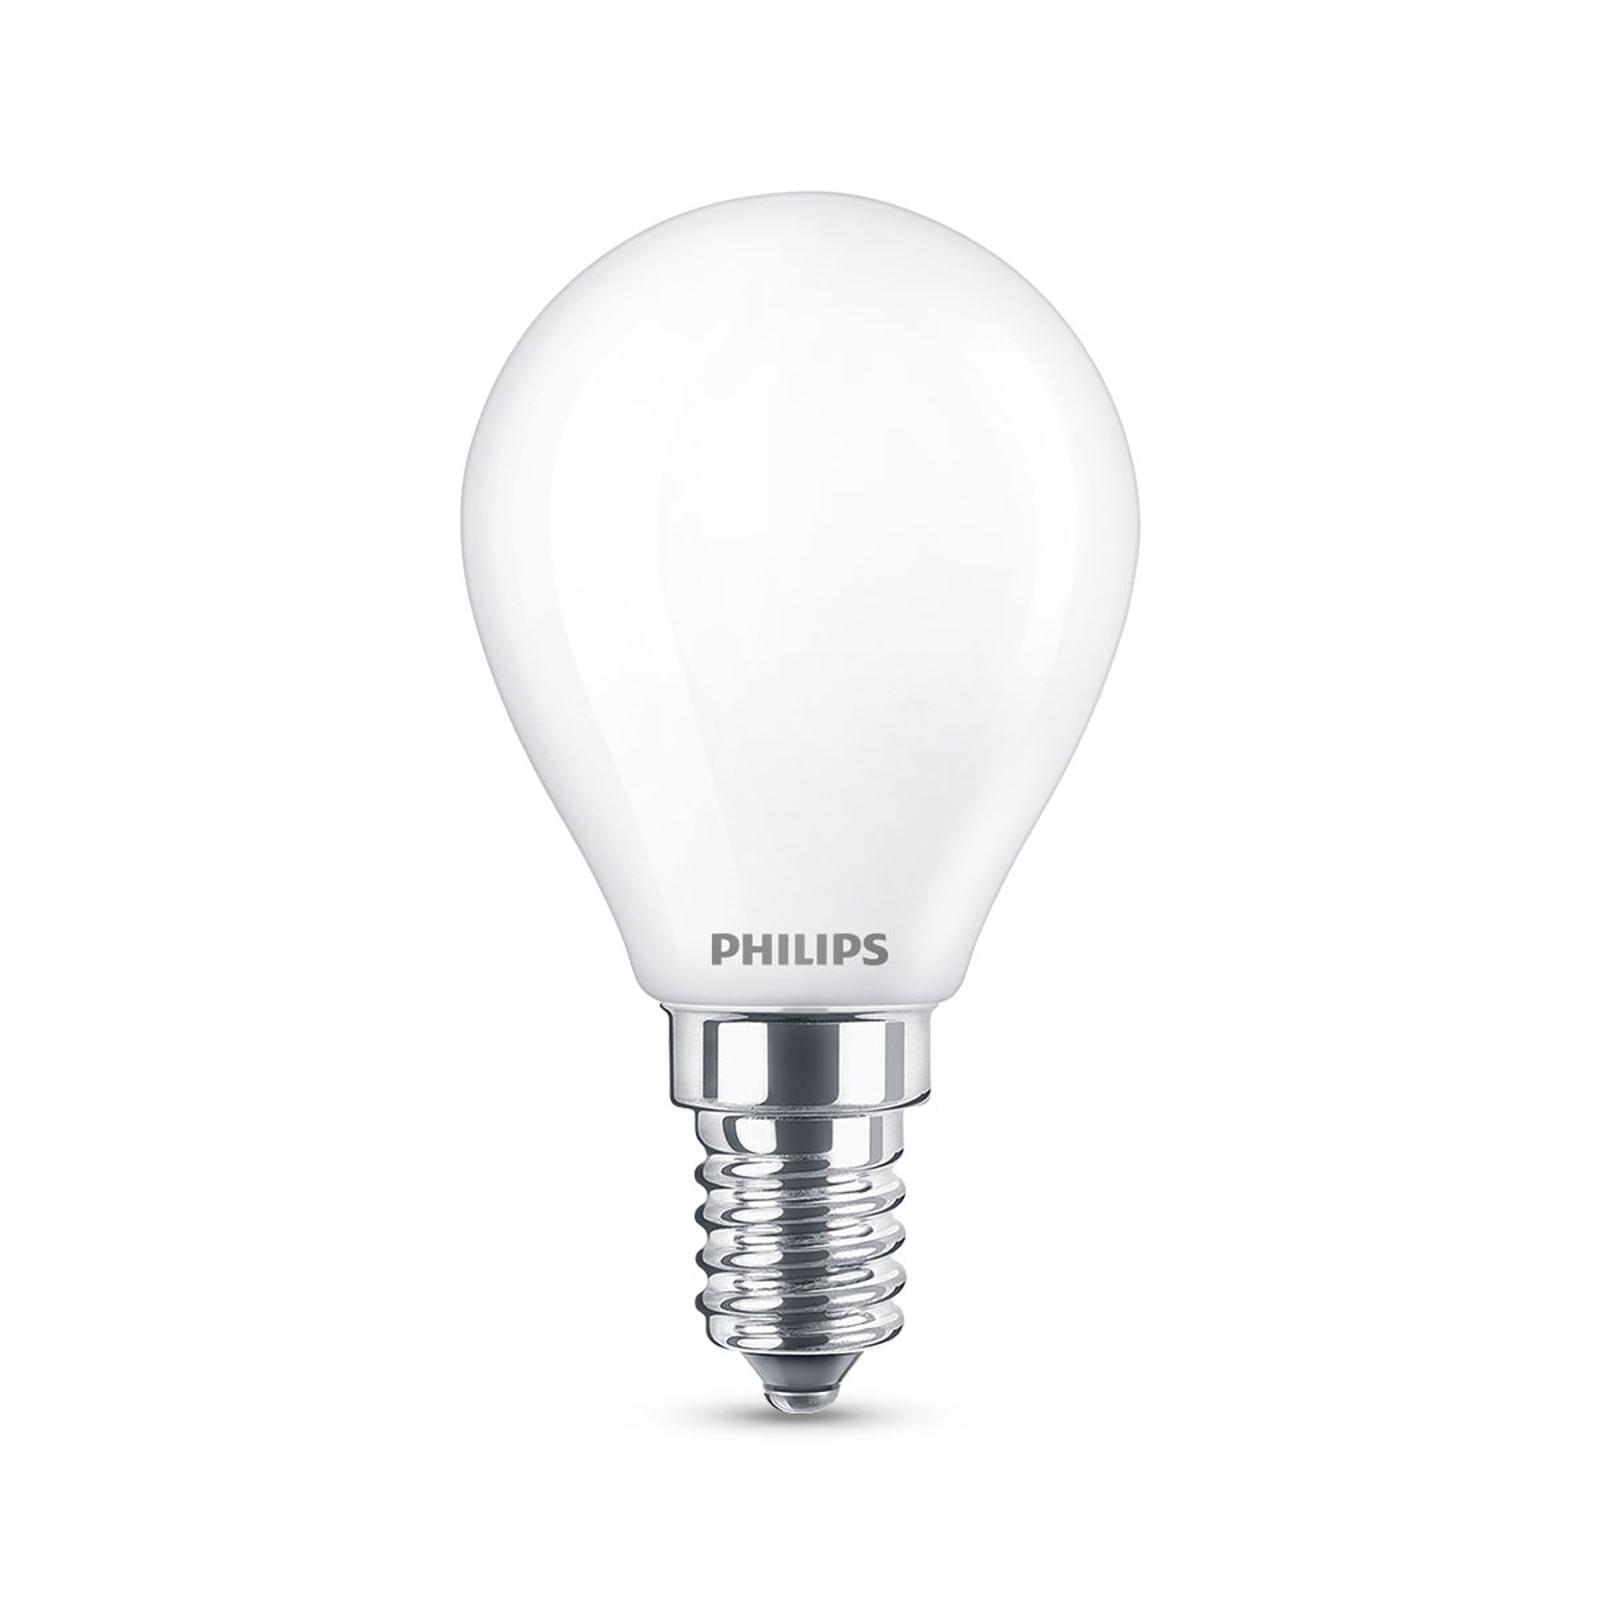 Philips Classic LED lamp E14 P45 6,5W 2.700K mat